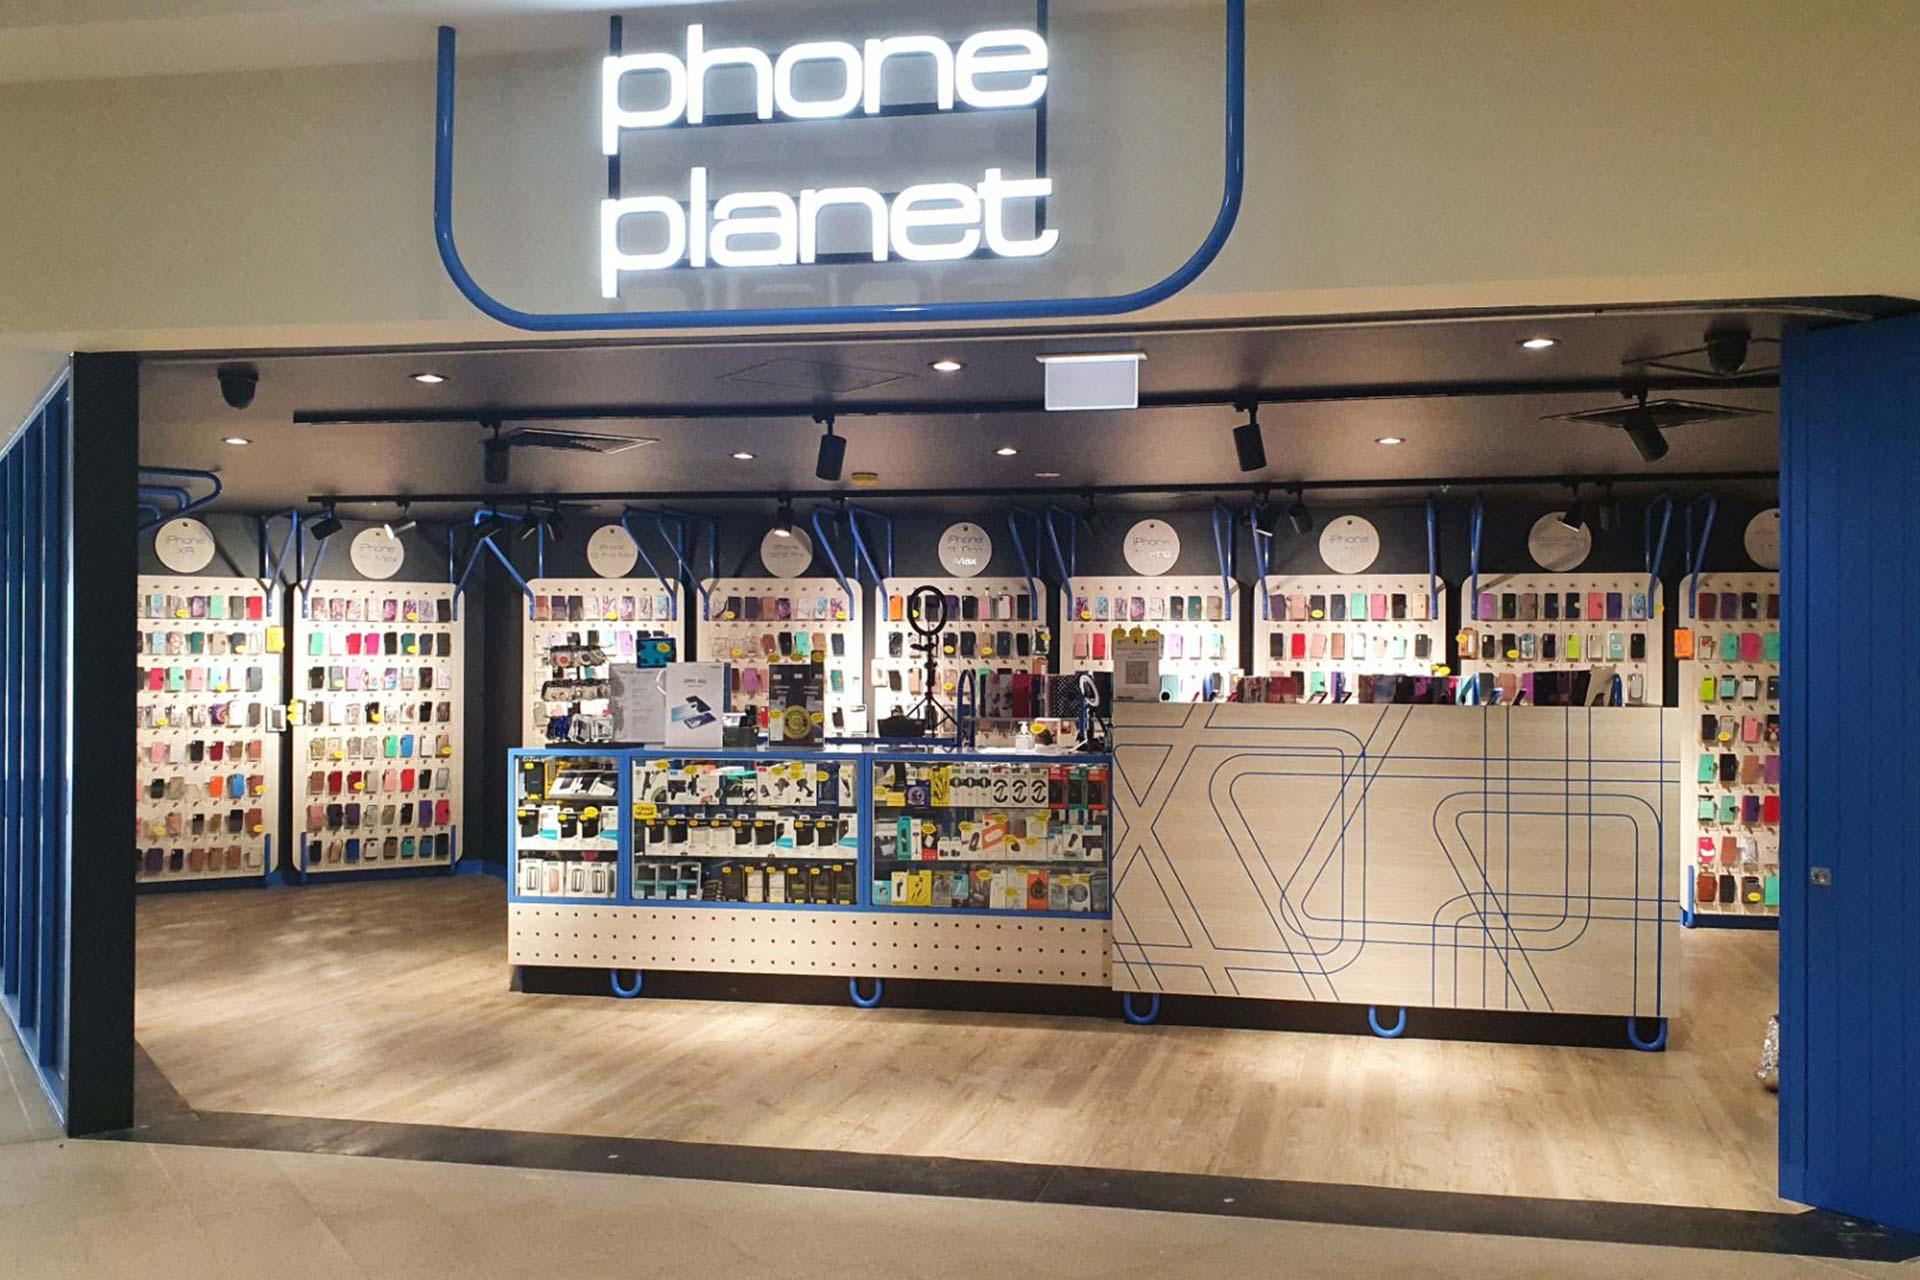 PhonePlanet-Warnbro-01